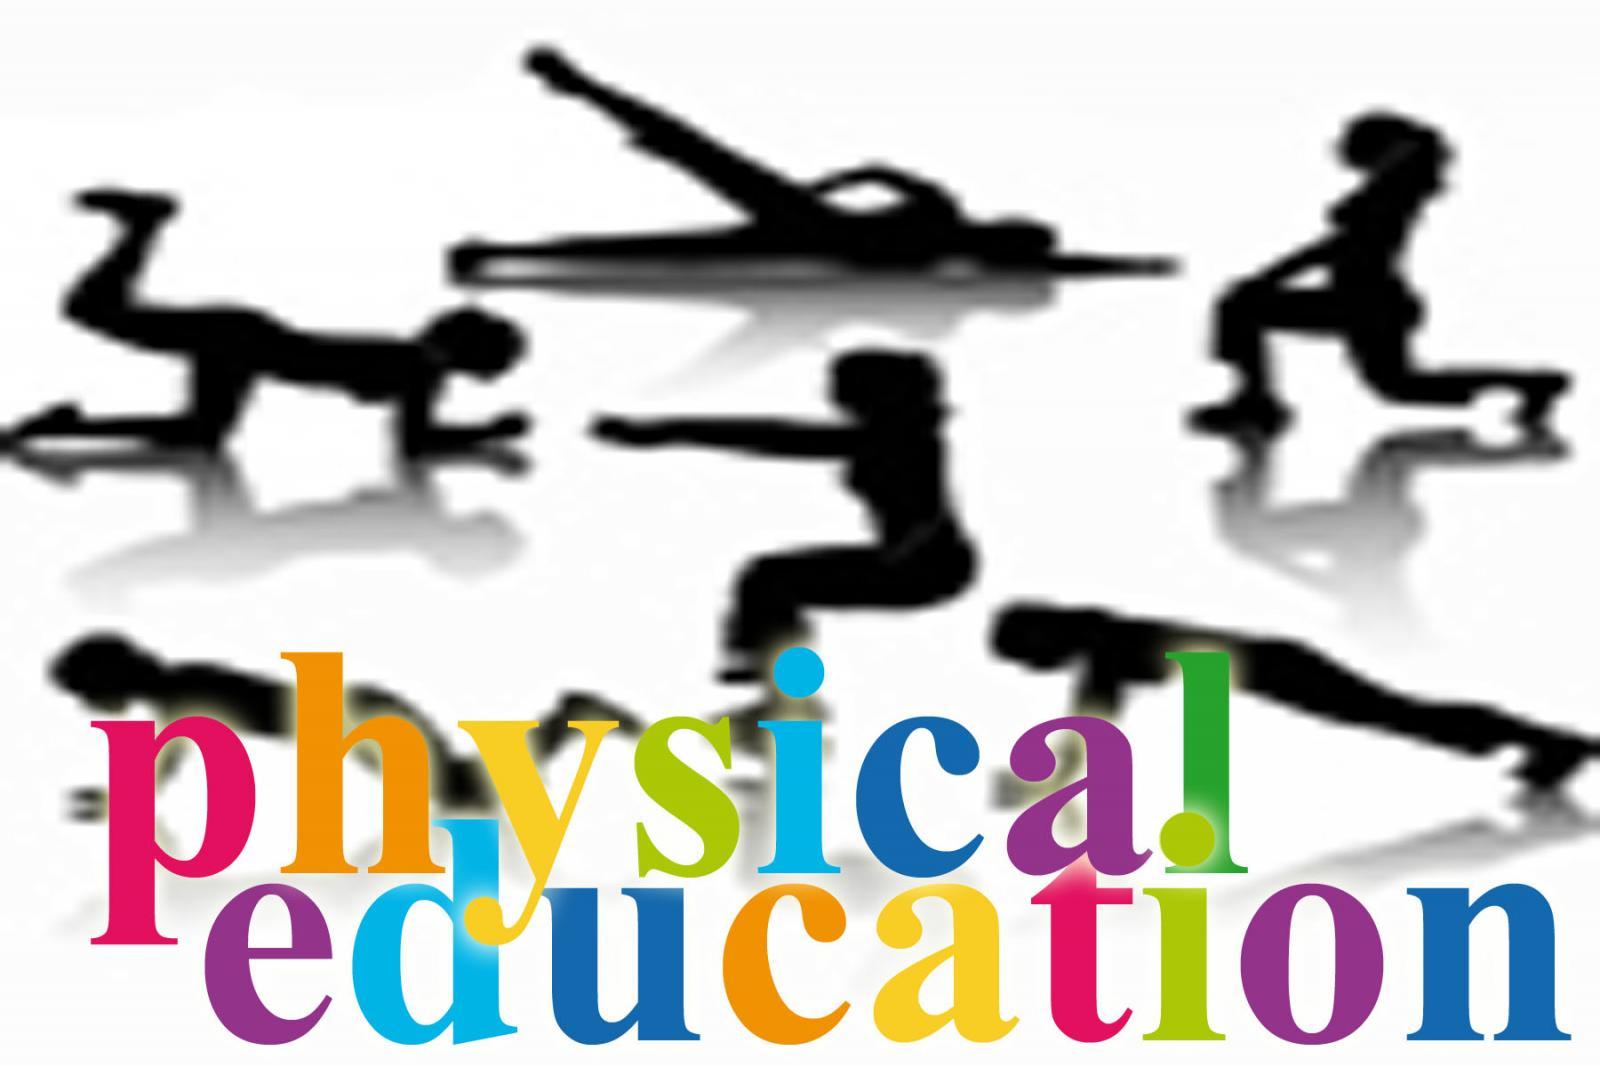 physical education clip art clipart panda free clipart images rh clipartpanda com animated physical education clipart physical education clipart